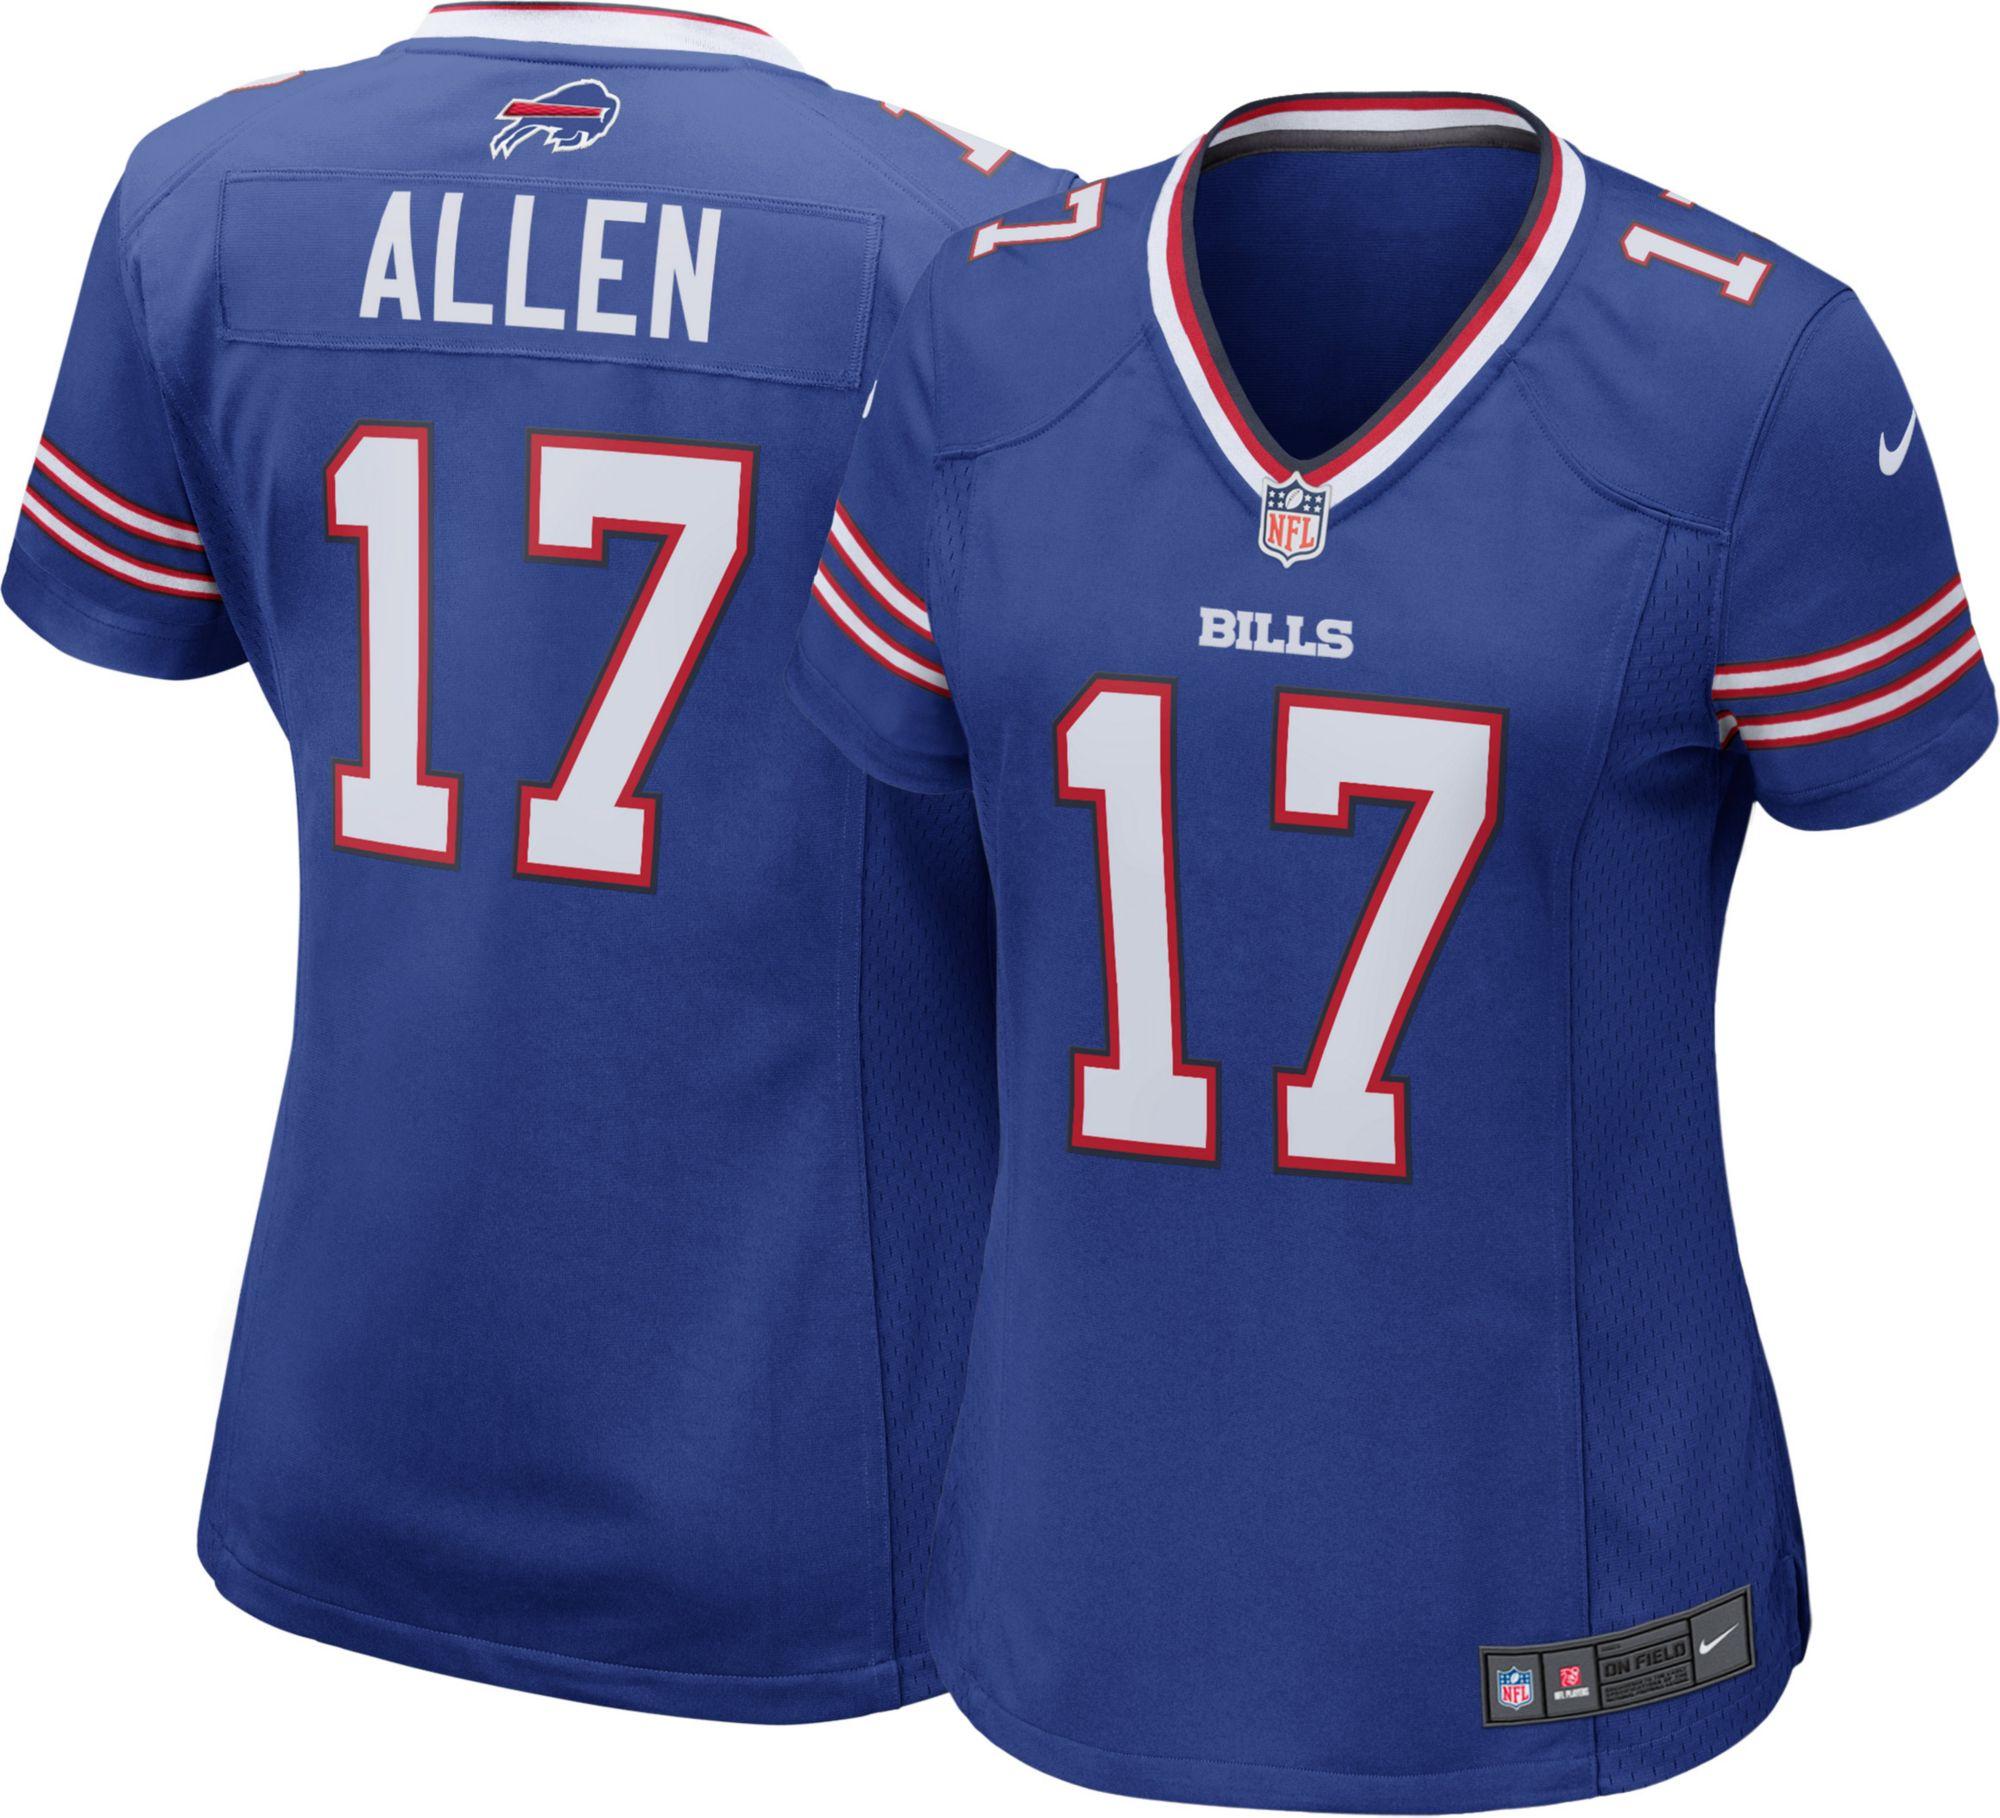 bills home jersey